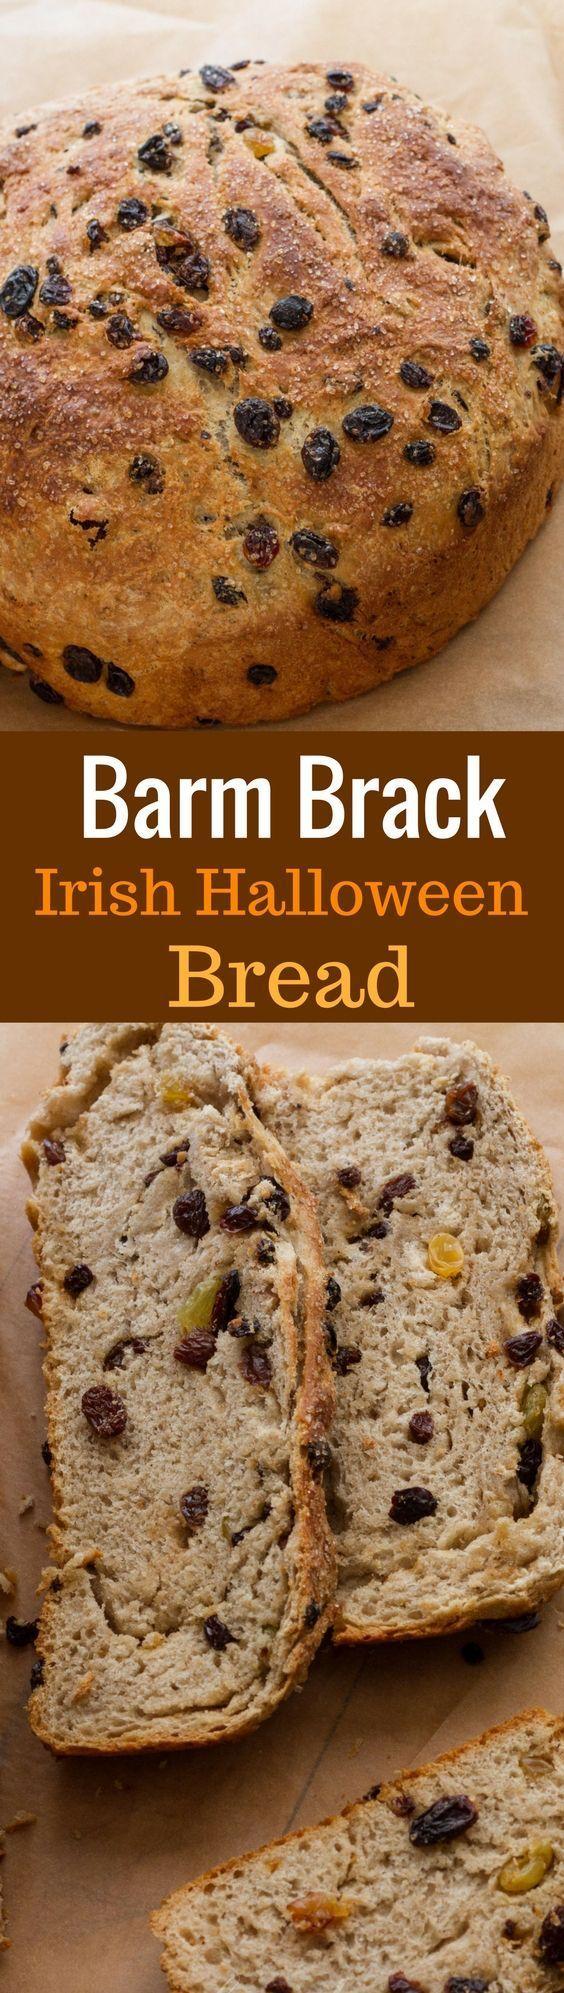 Barm Brack - Irish Halloween Bread - a little sweeter than sandwich bread, but not as rich as cake   www.savingdessert.com